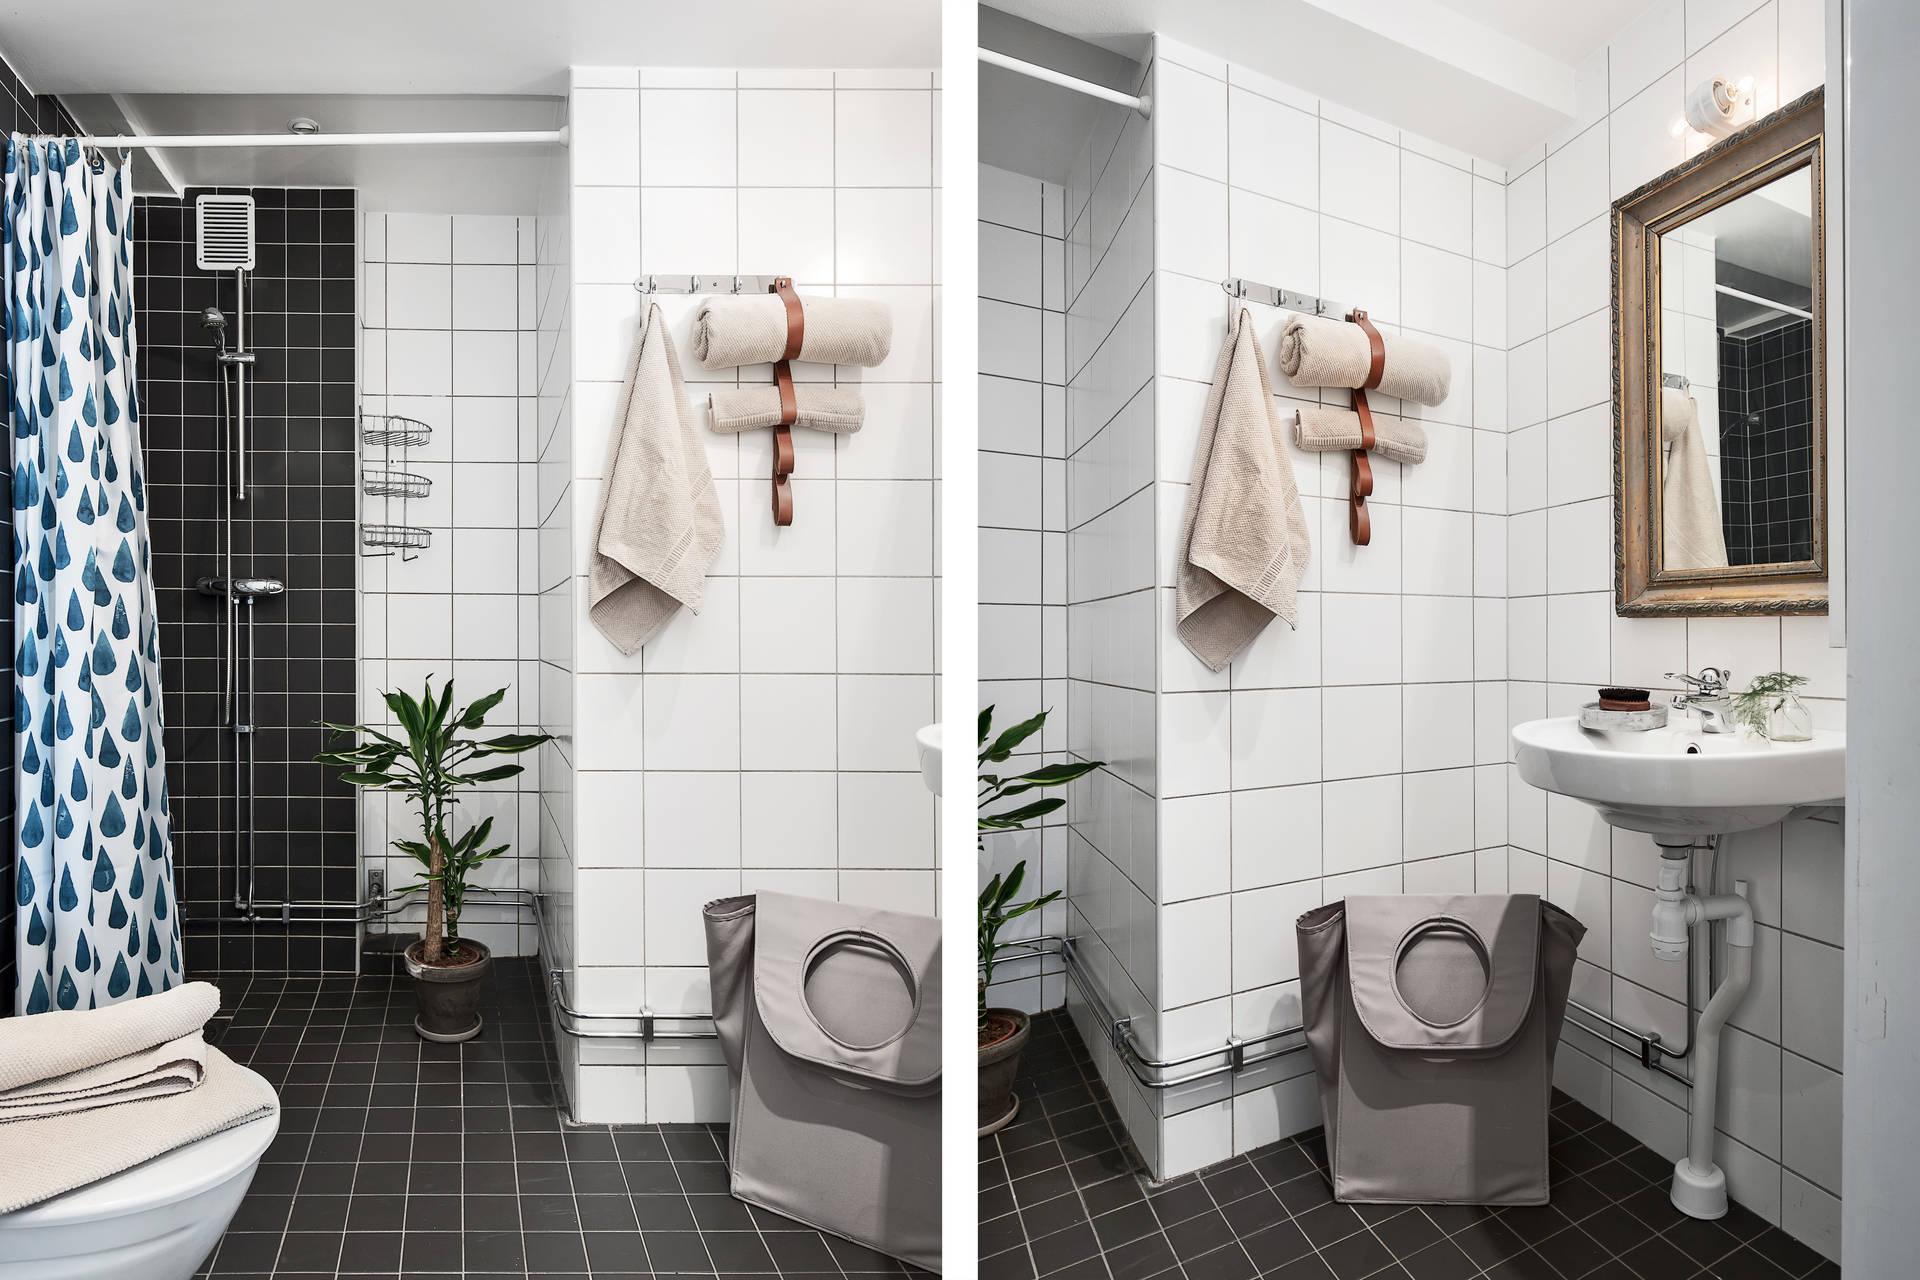 санузел душ раковина зеркало кран